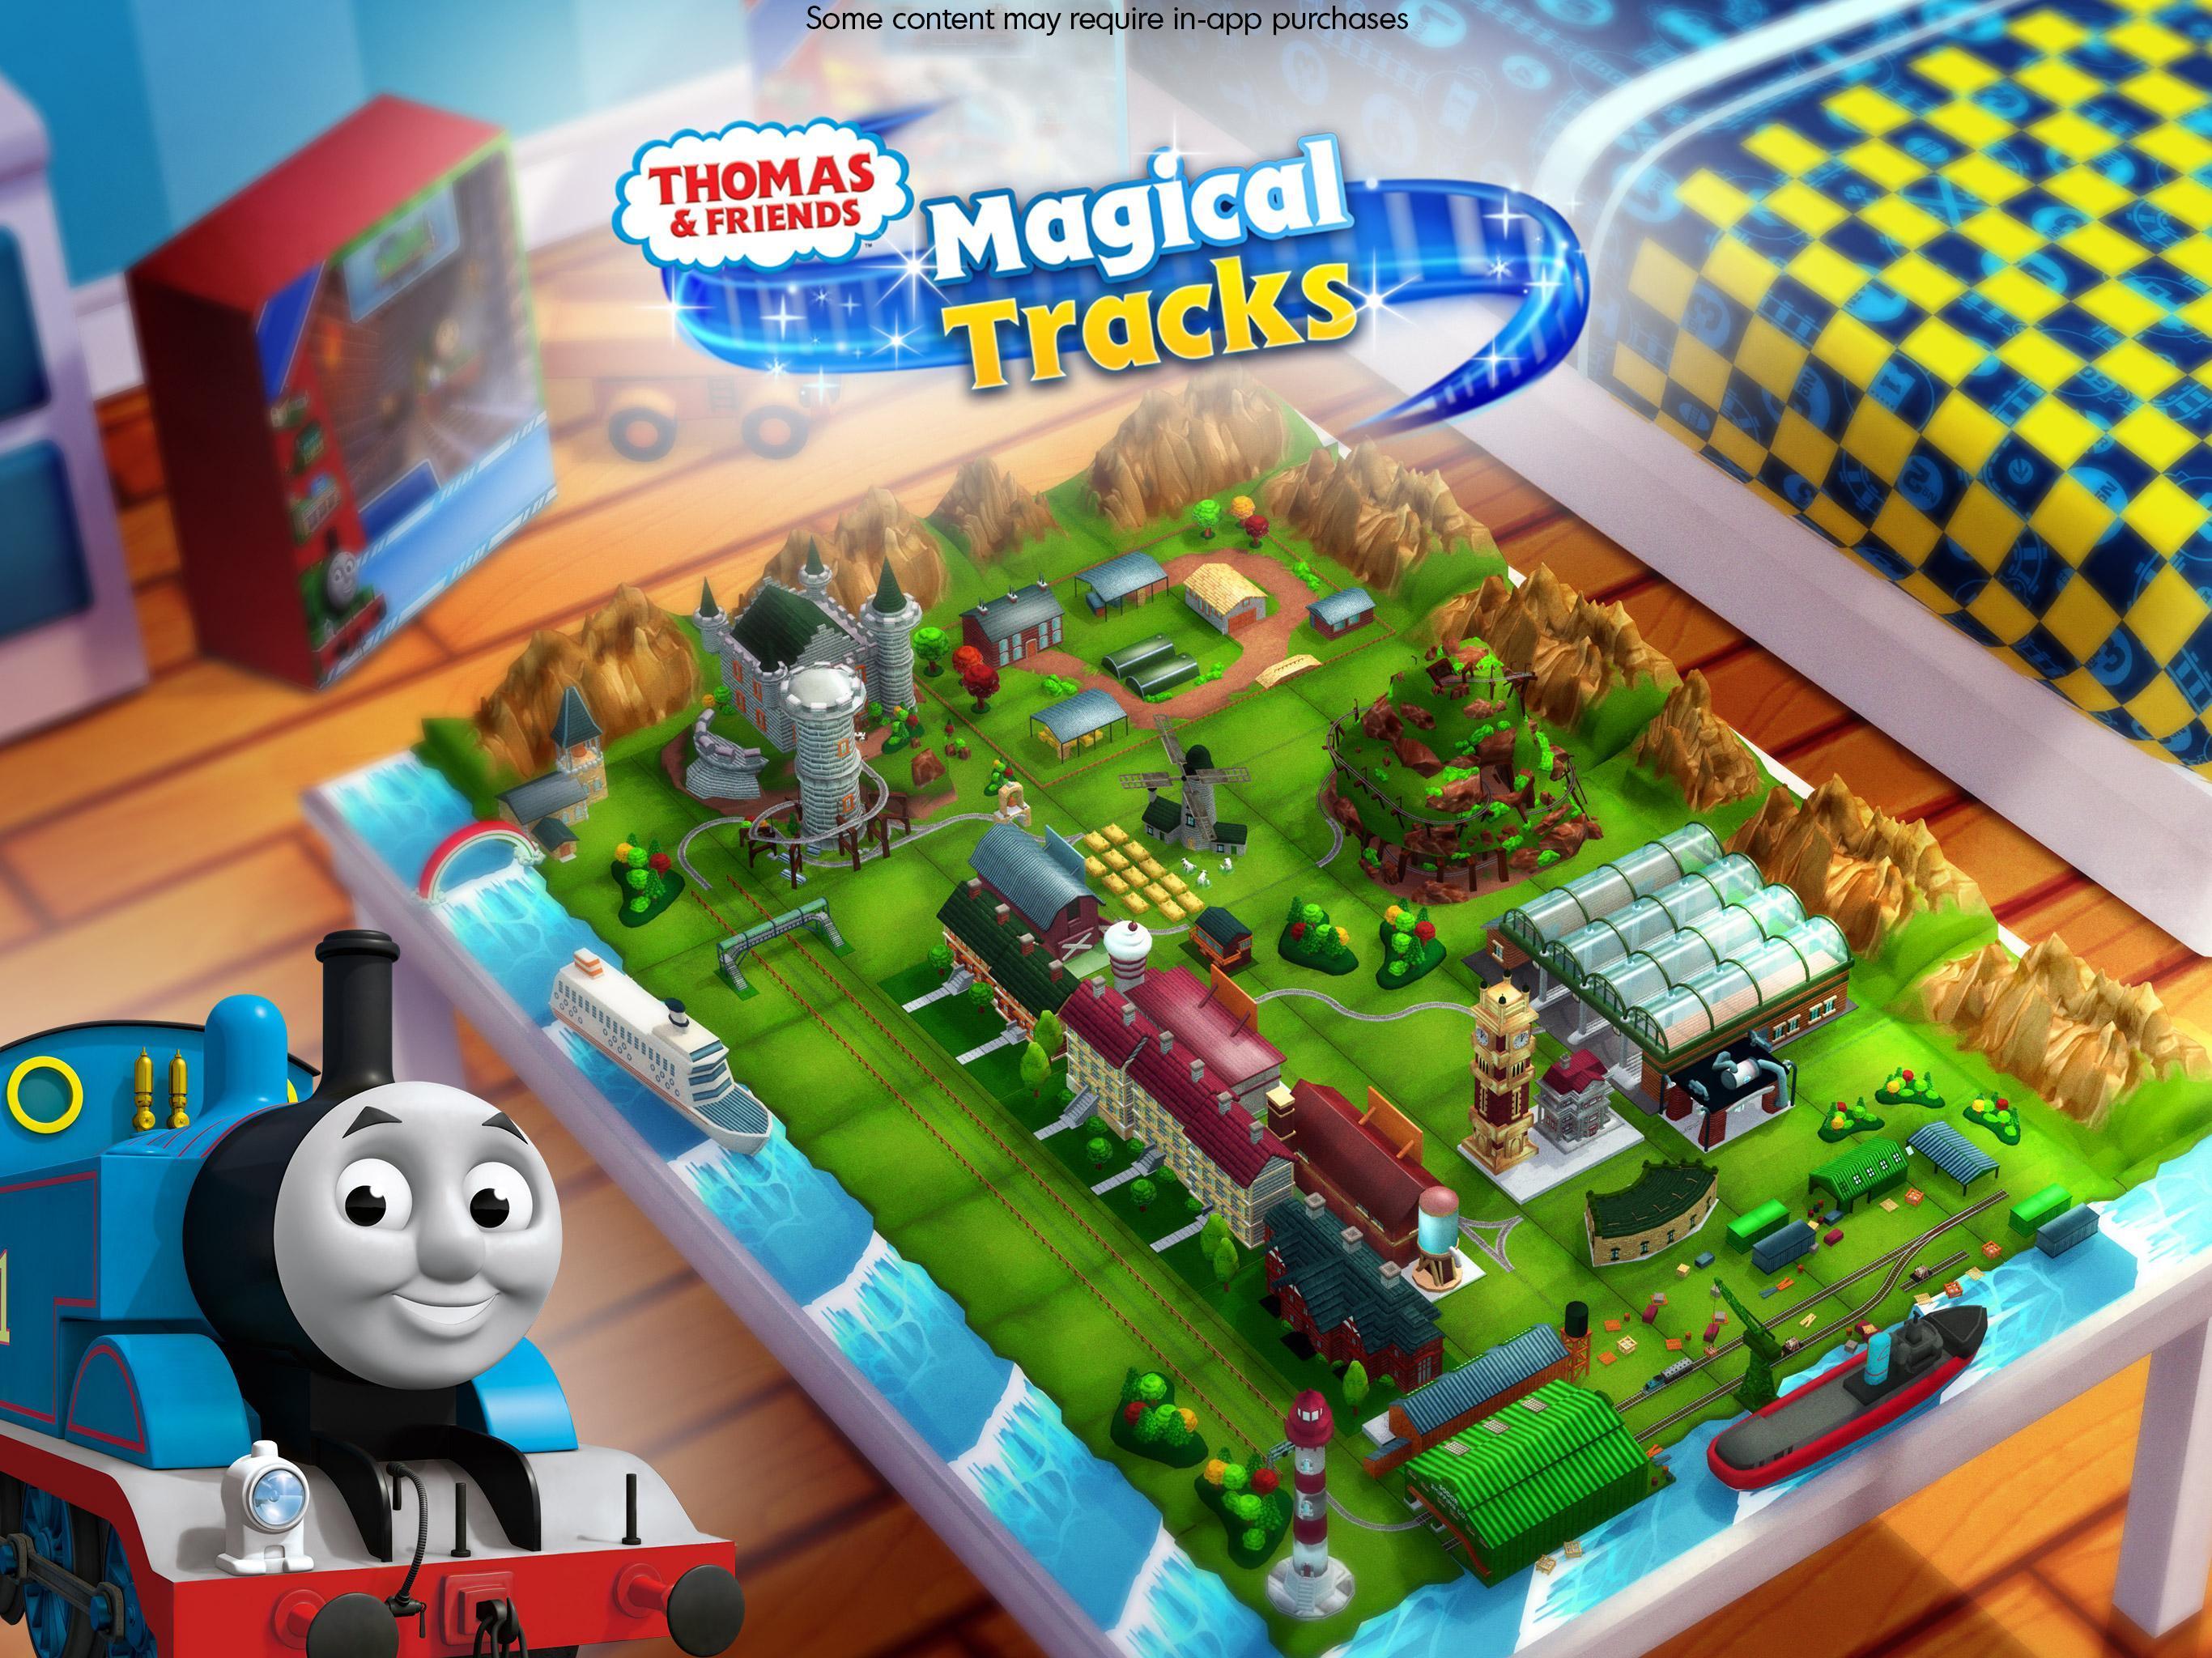 Thomas & Friends: Magical Tracks 1.10 Screenshot 6